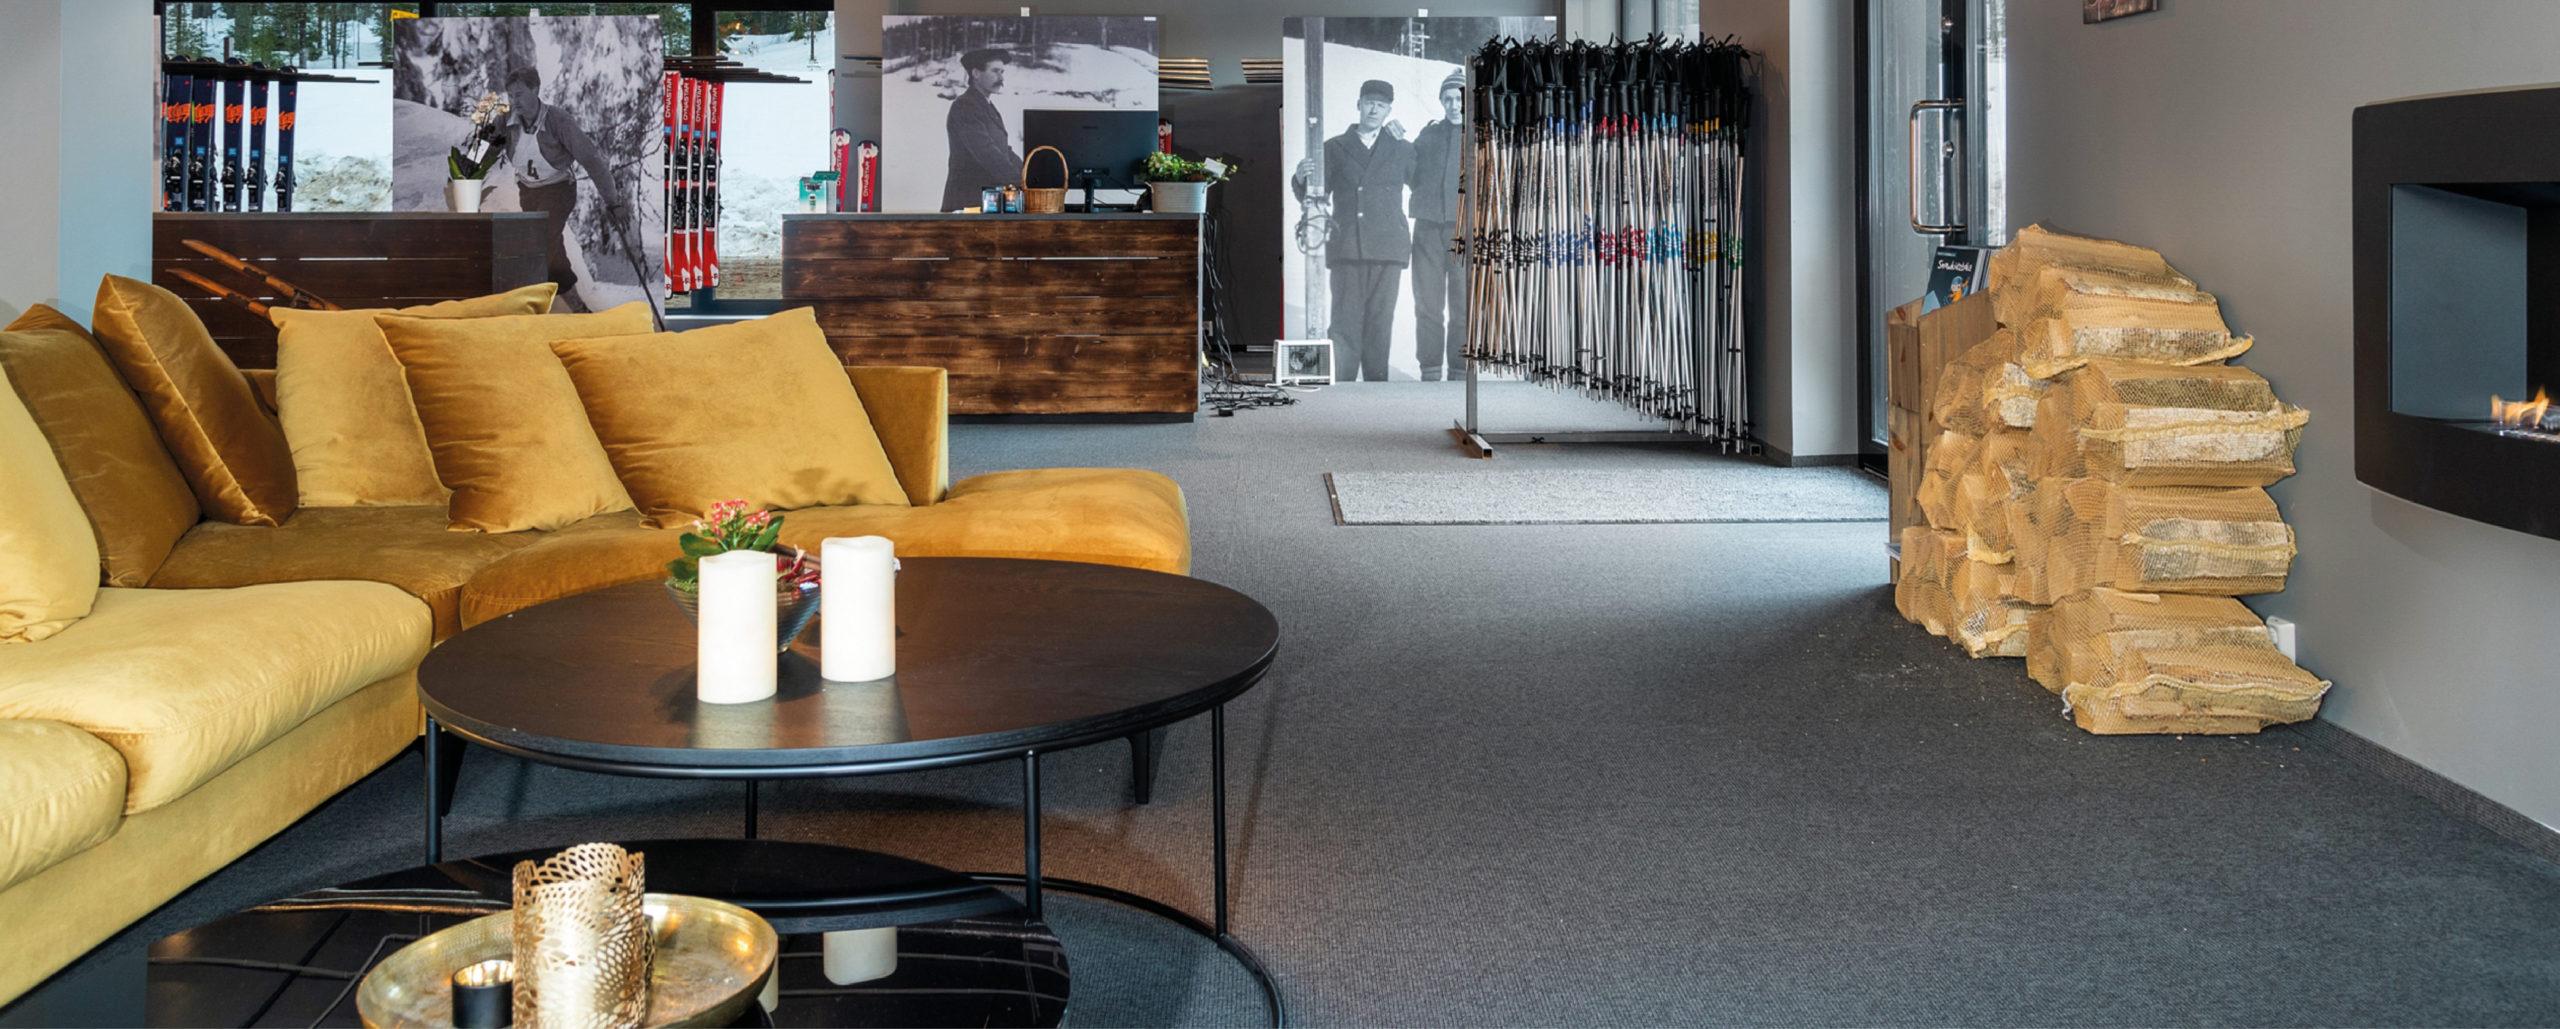 Resepsjonsområdet/reception area and ski rental, bookTrysilonline